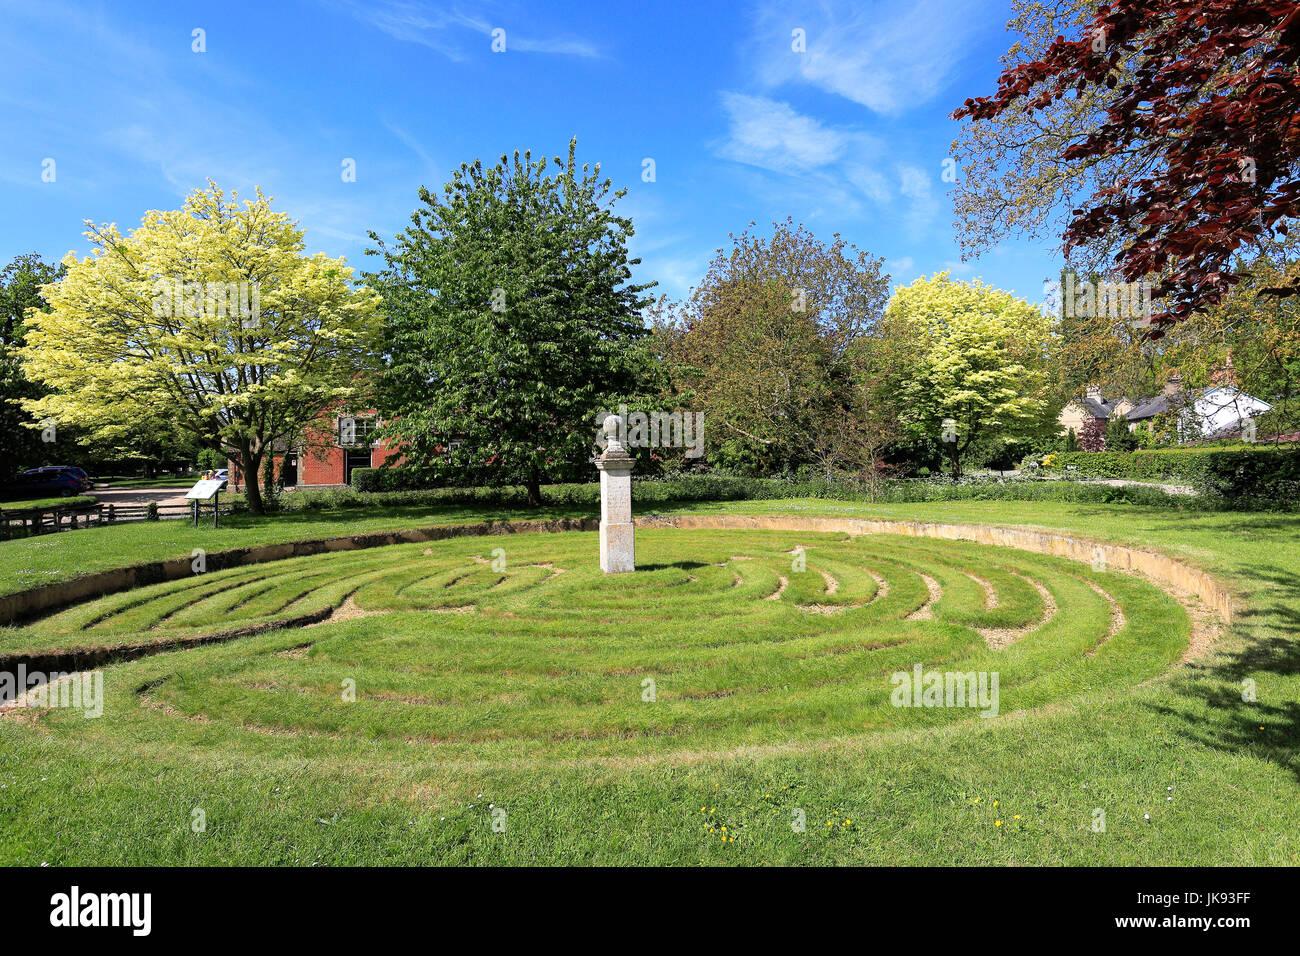 Summer, Hilton Turf Maze, Hilton village, Cambridgeshire, East Anglia, England, UK - Stock Image